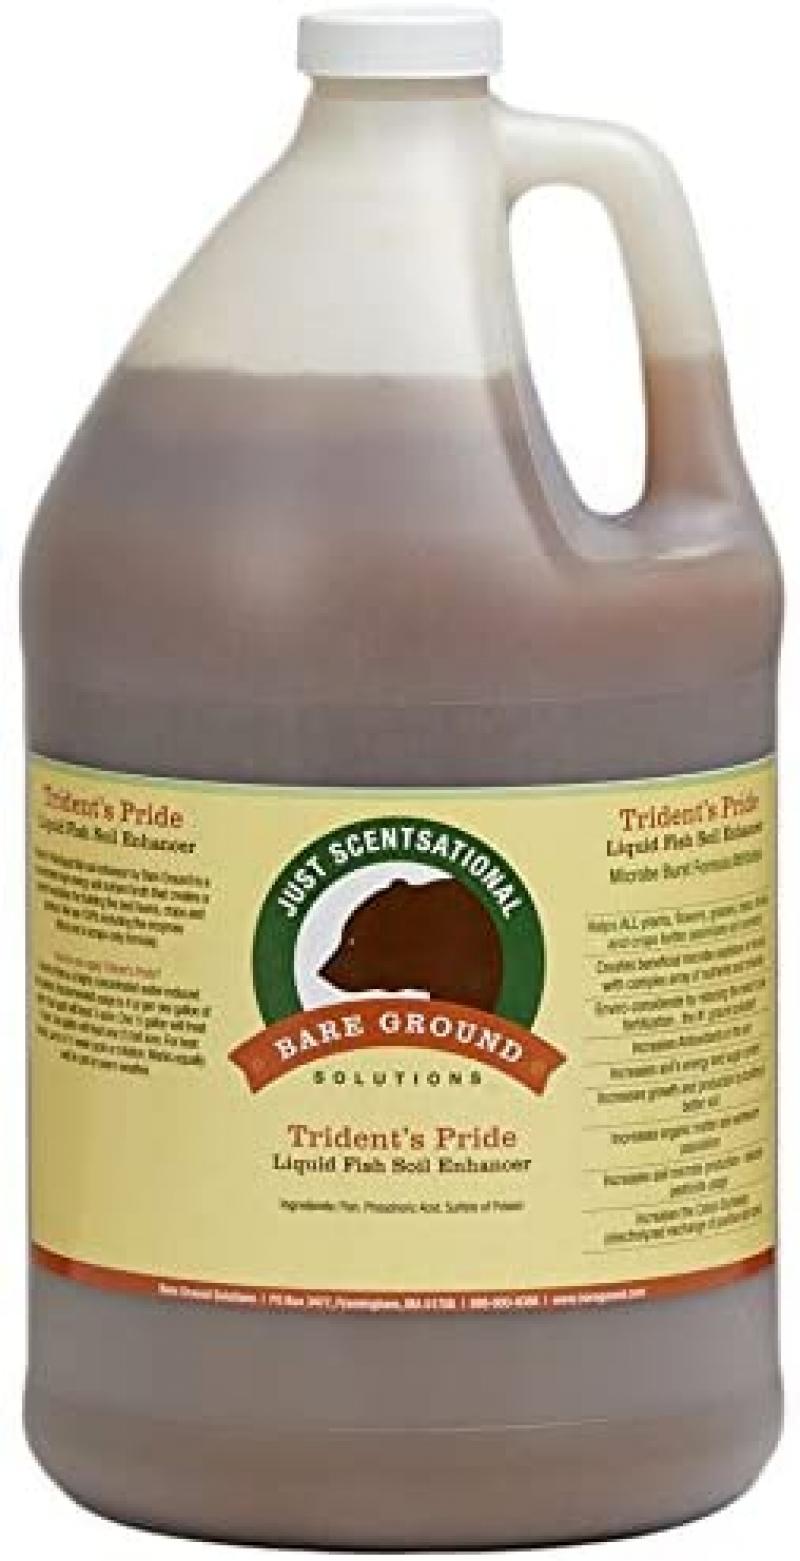 ihocon: Just Scentsational Trident's Pride Organic Liquid Fish Hydroponic Soil Fertilizer, 128 oz (1 Gallon) 有機魚肥